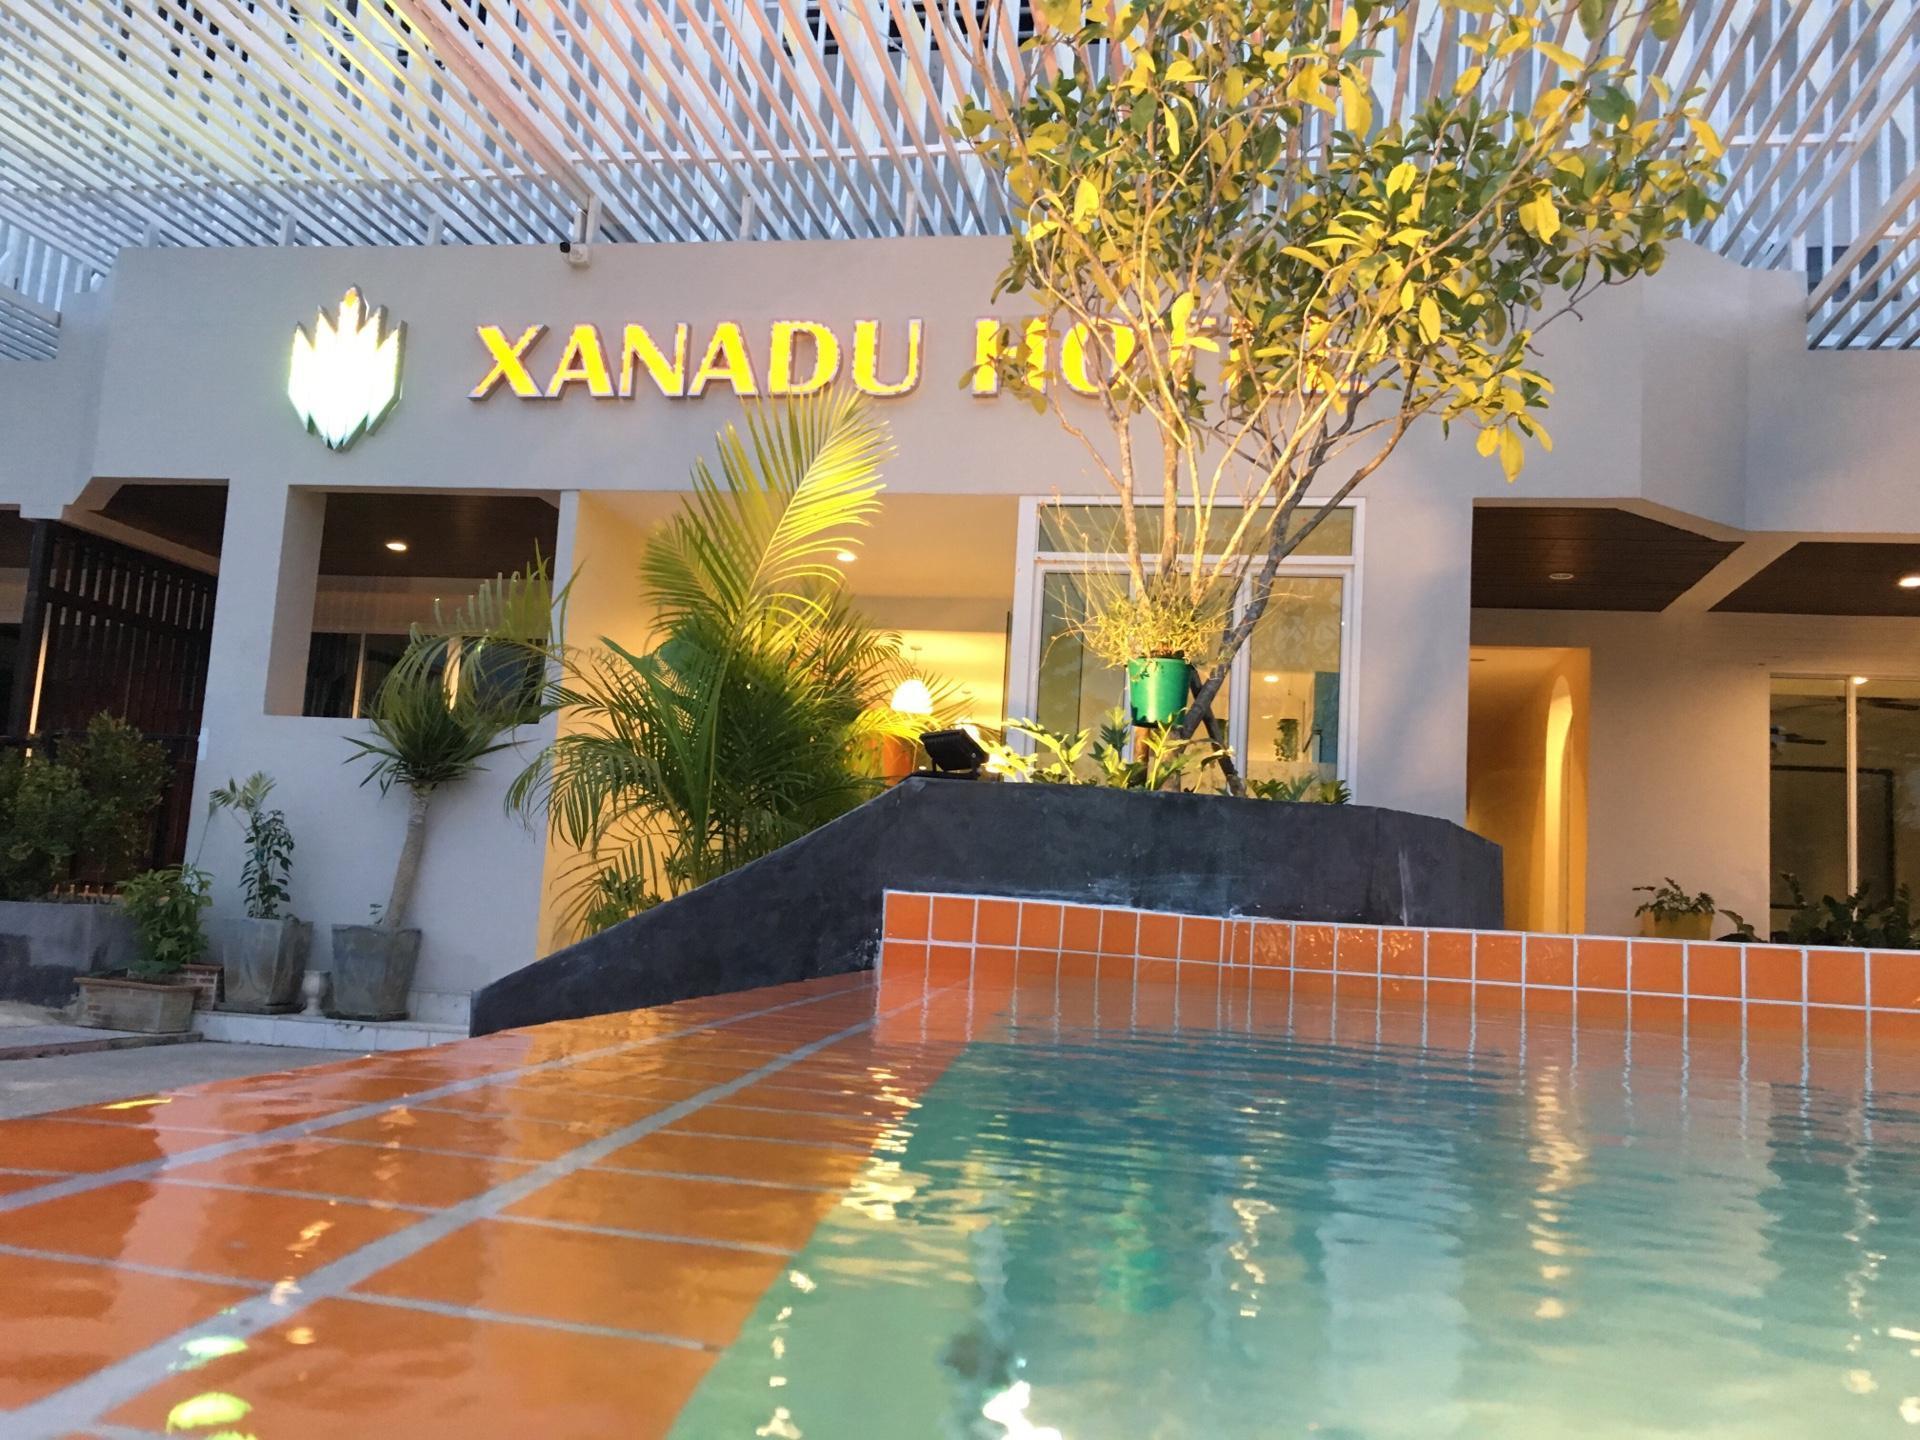 Xanadu Hotel Utapao